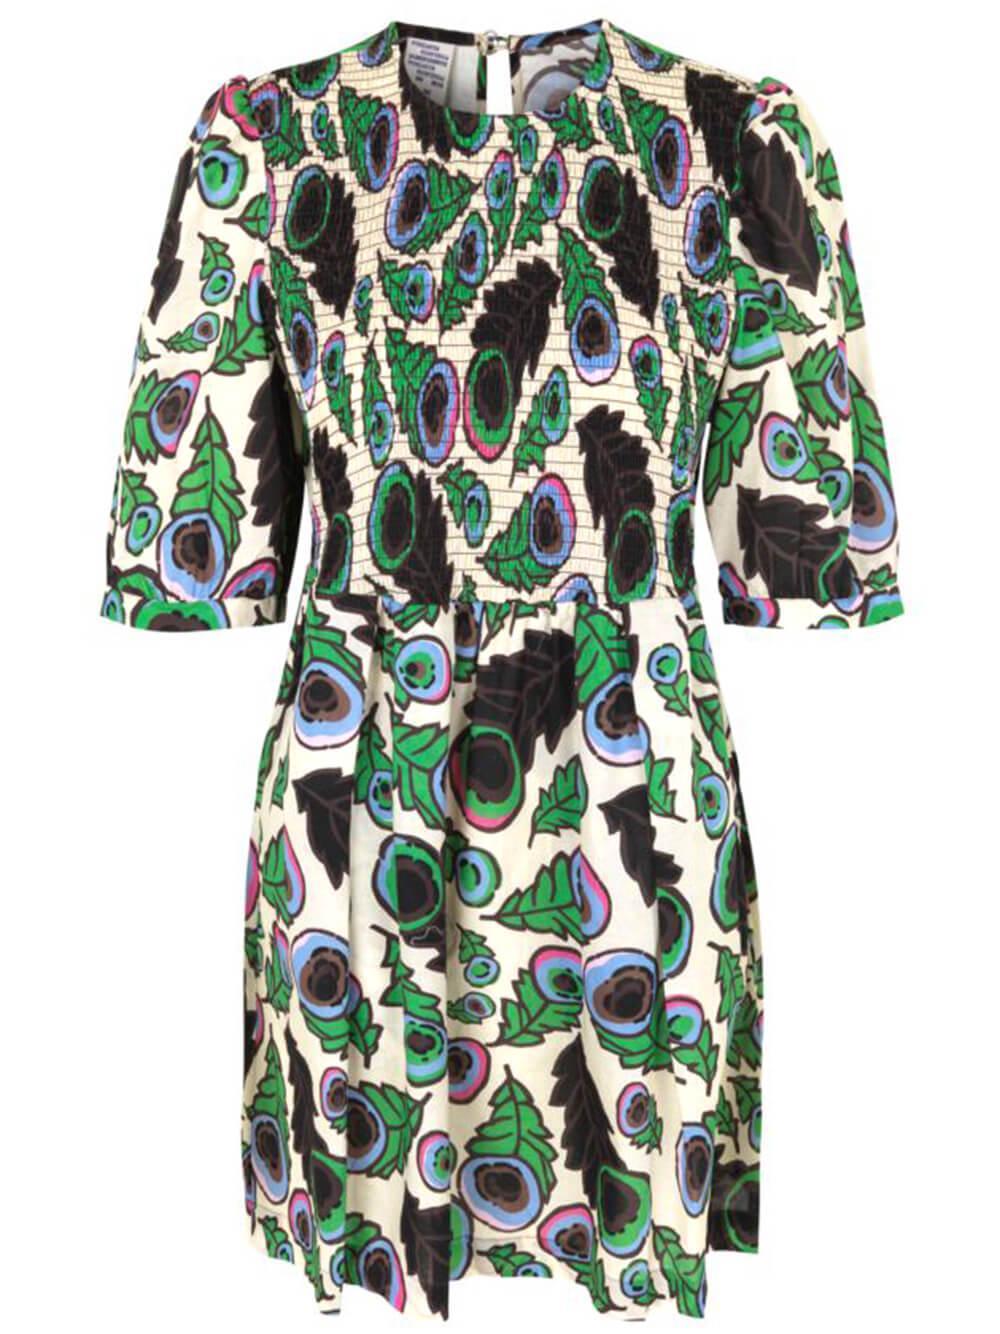 Amalda Dress Item # 21898